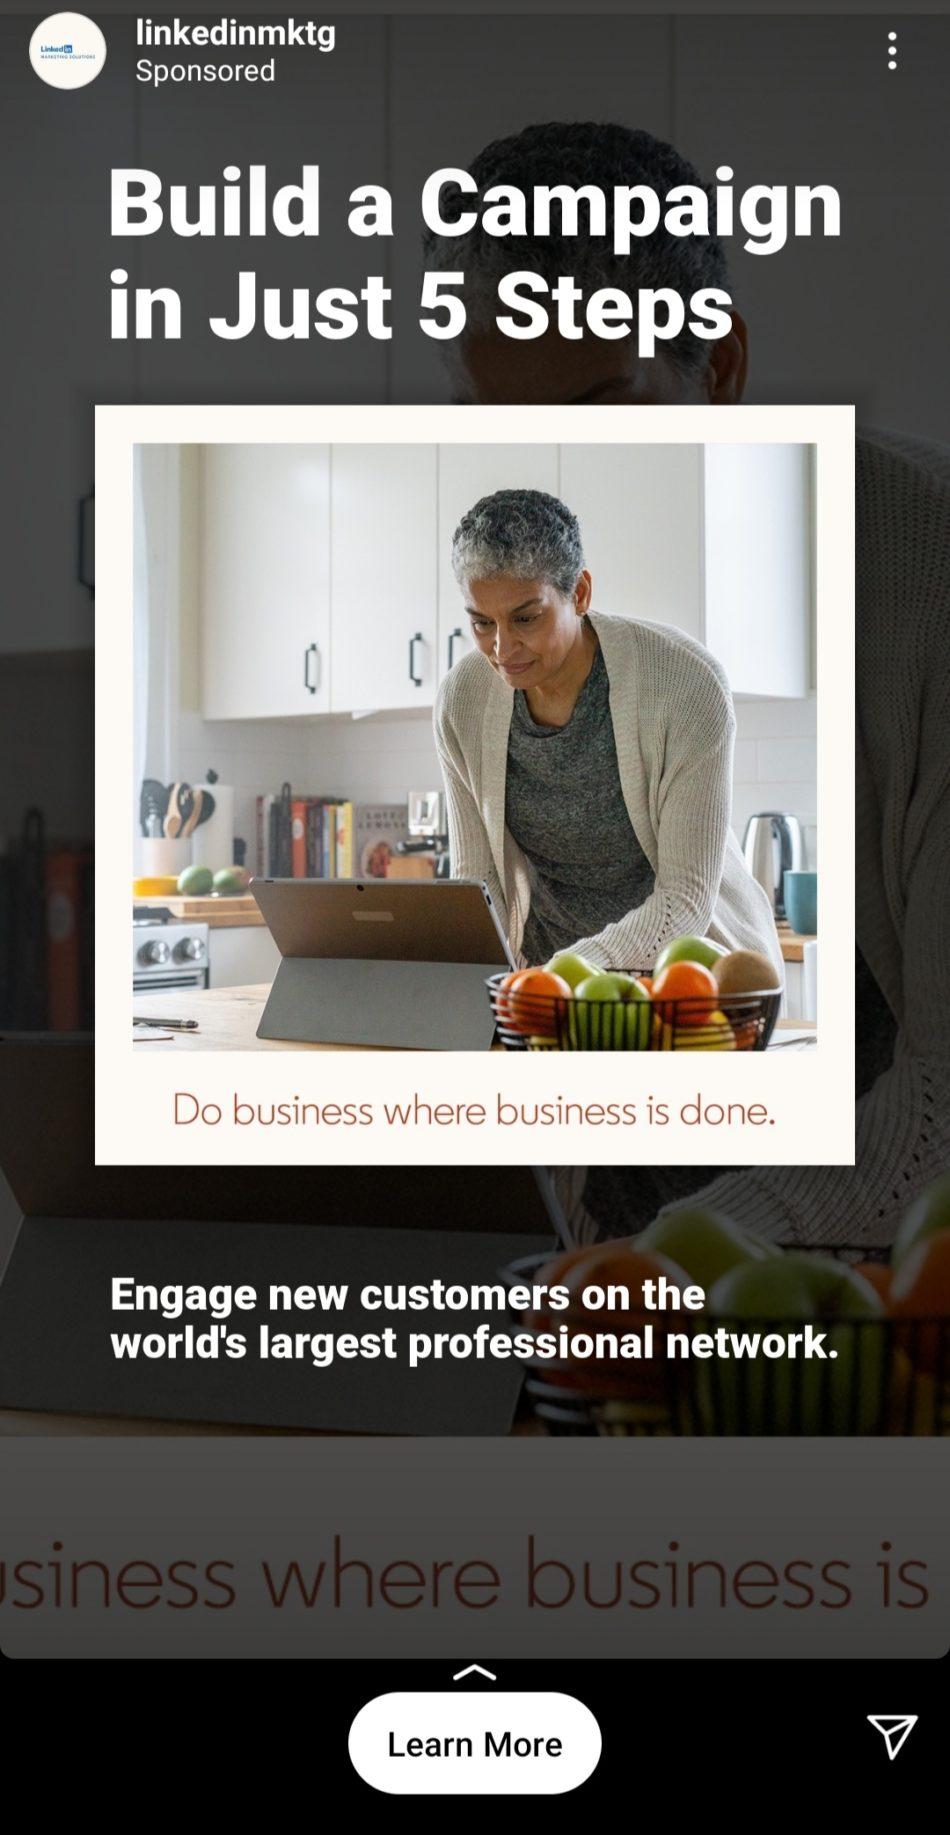 linkedin marketing instagram ad